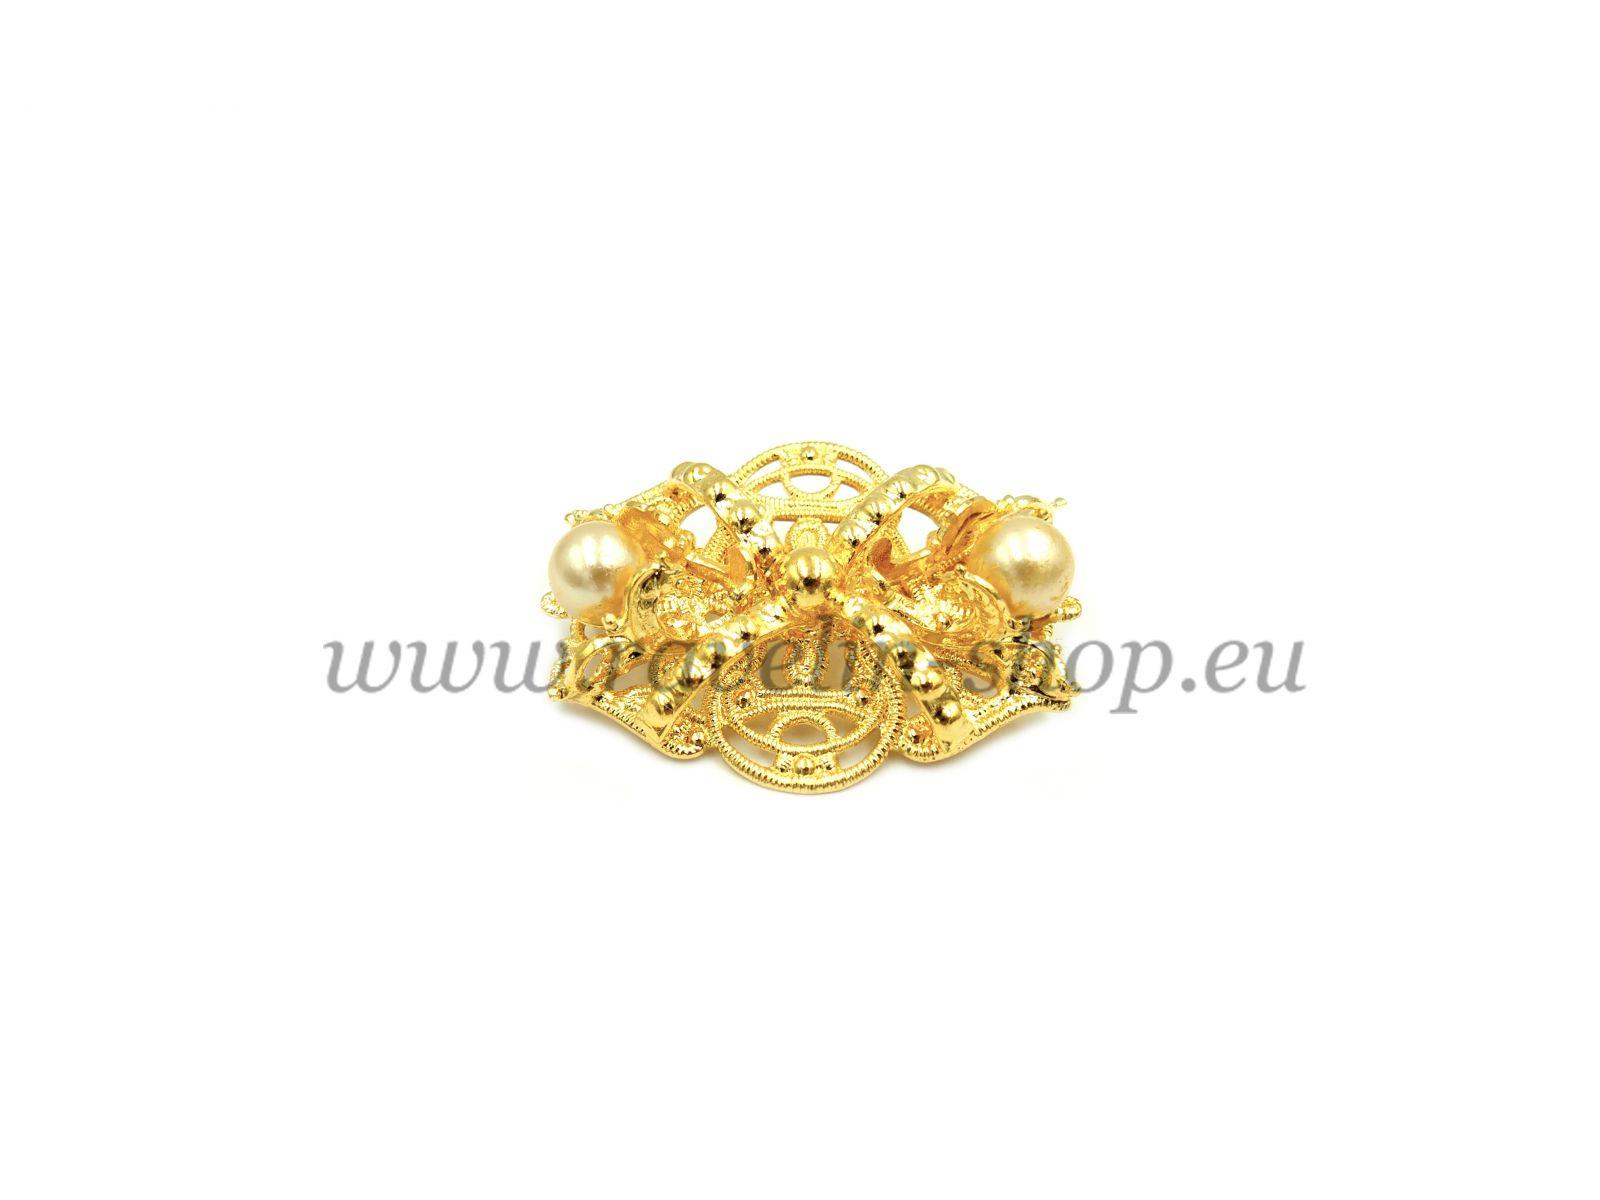 brož s perlami, pozlacená (g)